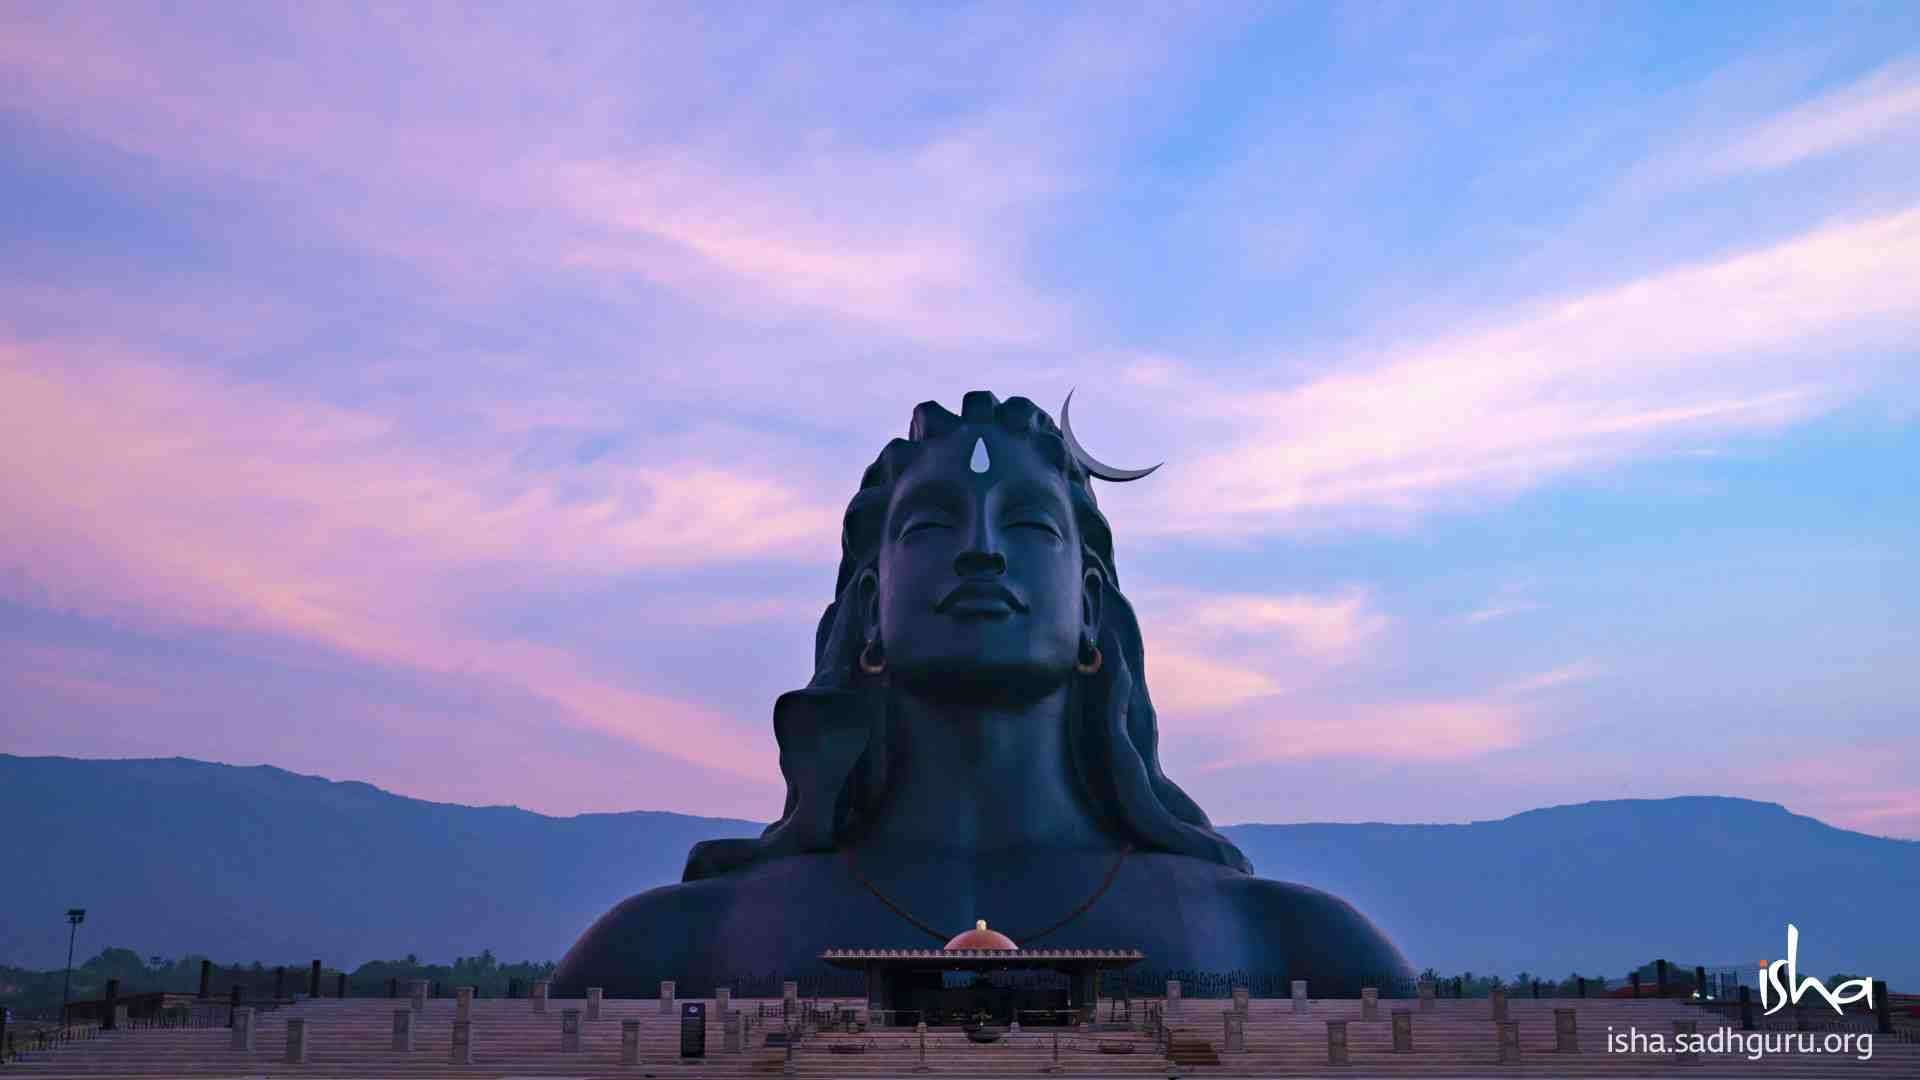 Shiva Wallpaper - on a blue and purple sky